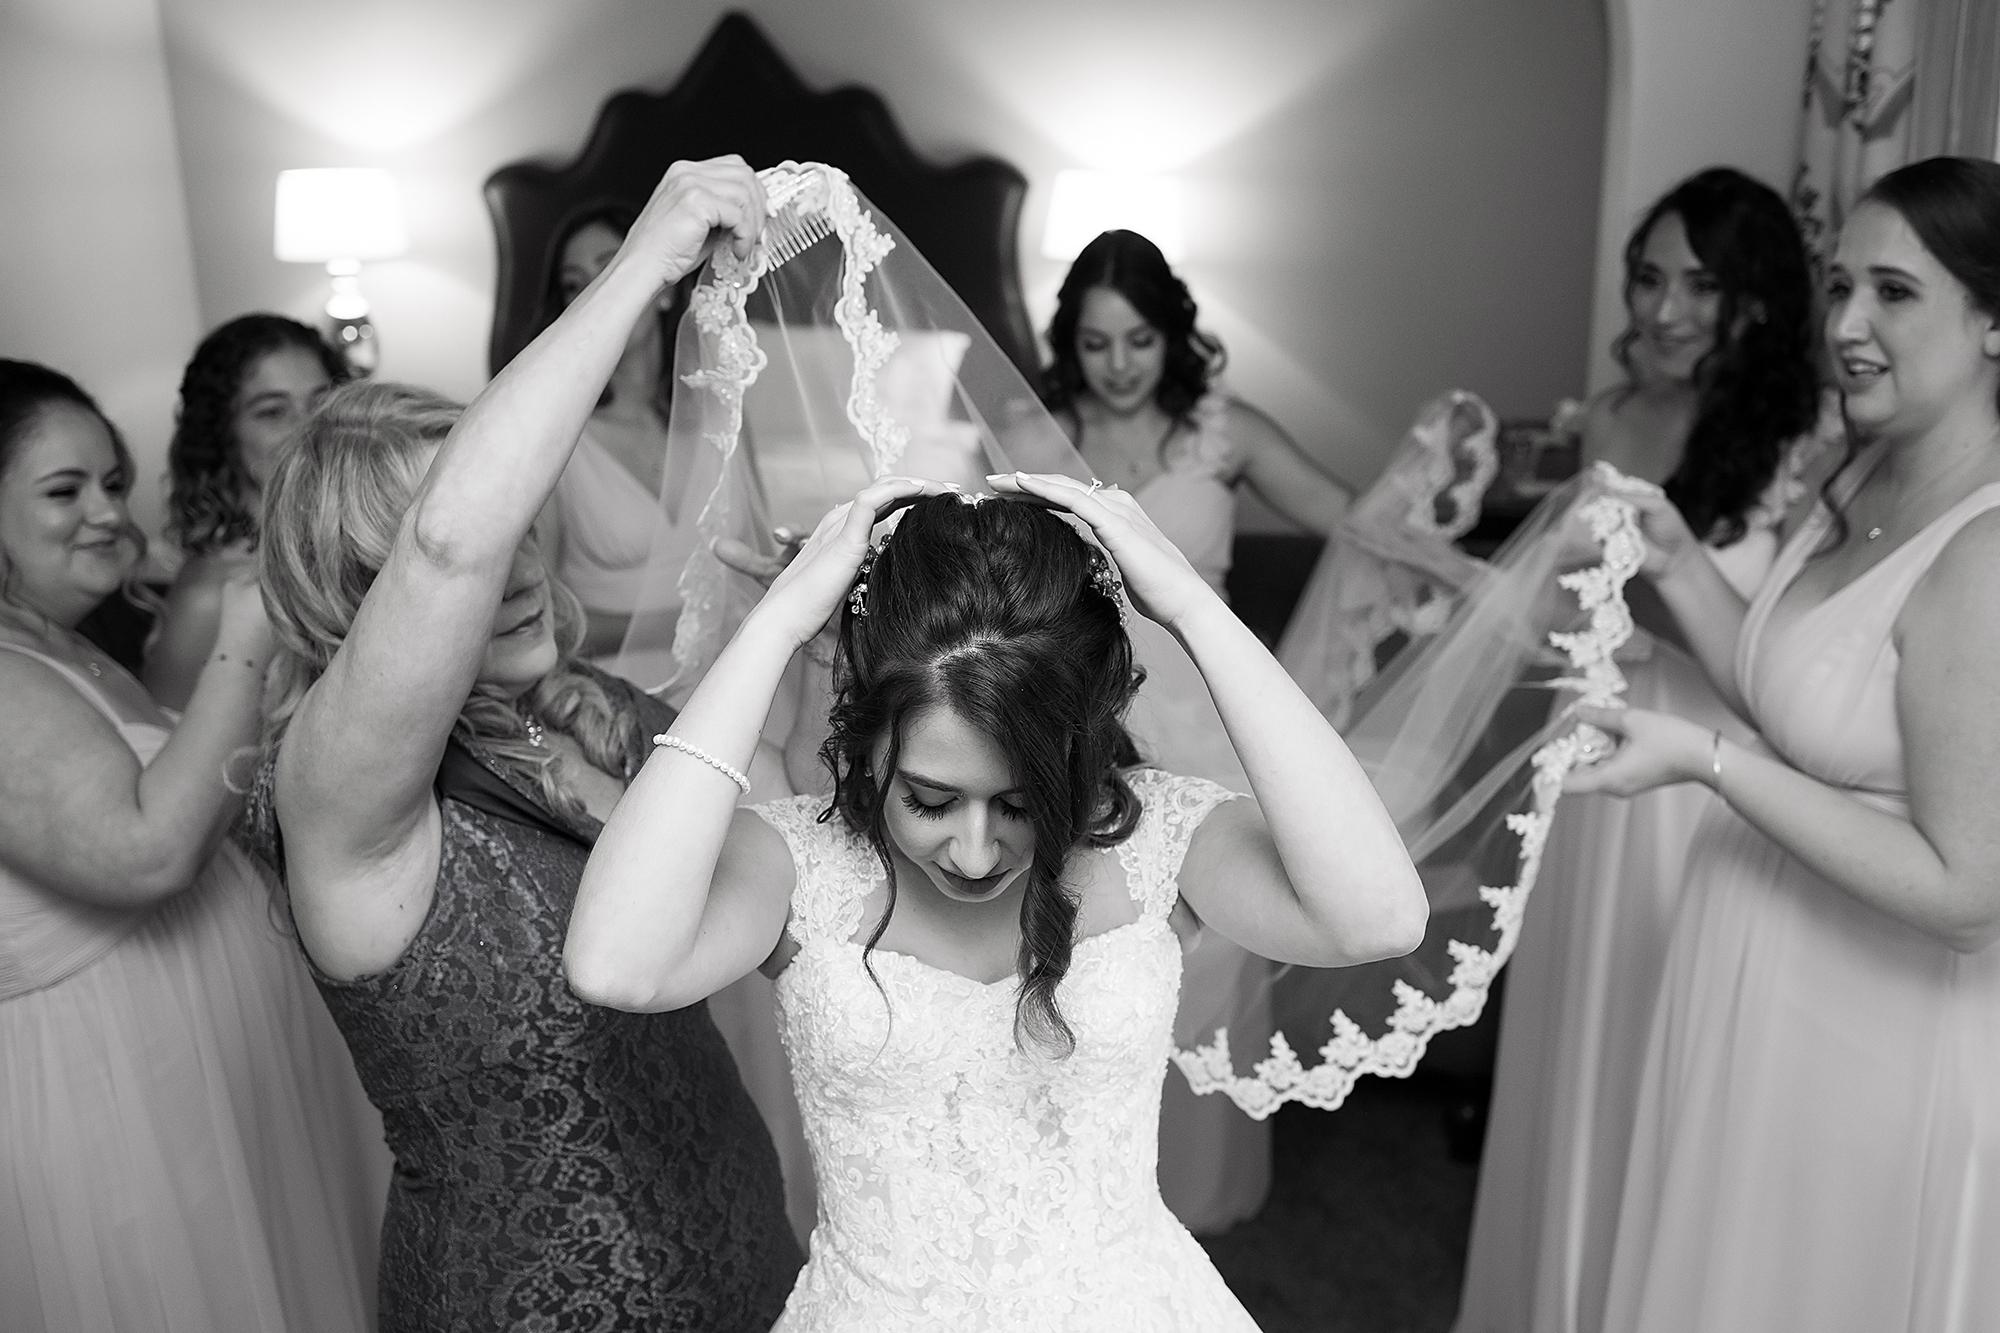 mount-dora-wedding-venues.jpg